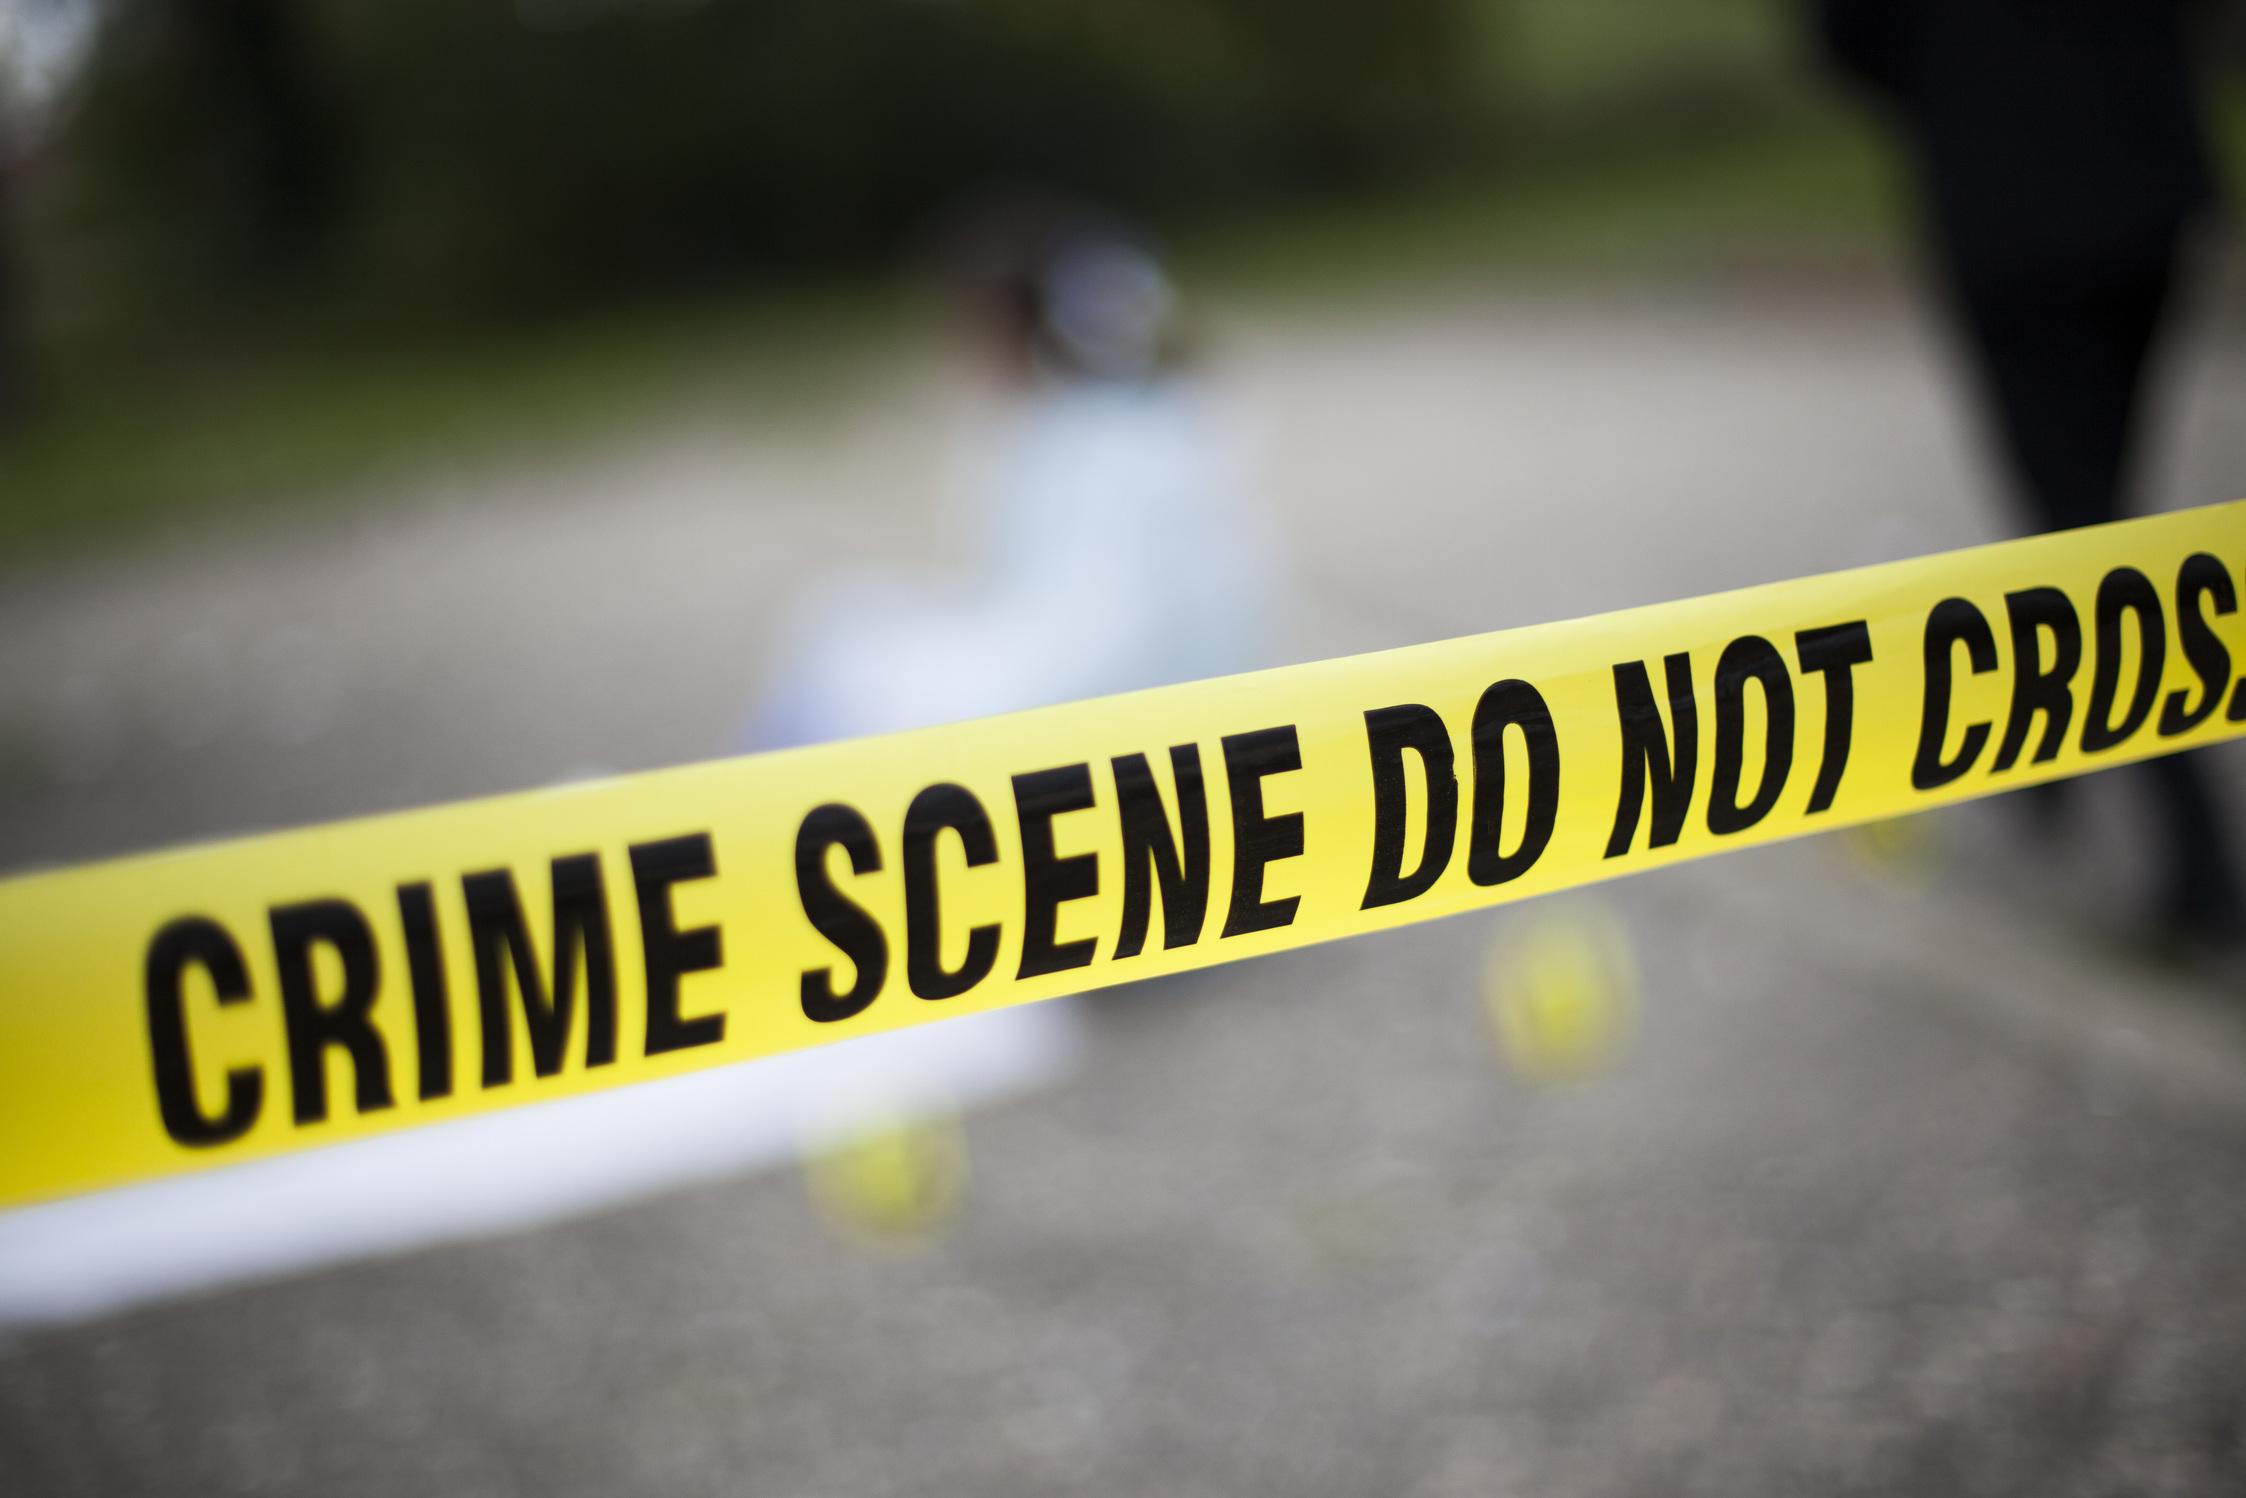 Cincinnati Violent Crime: A 2014-2015 Statistical Comparison